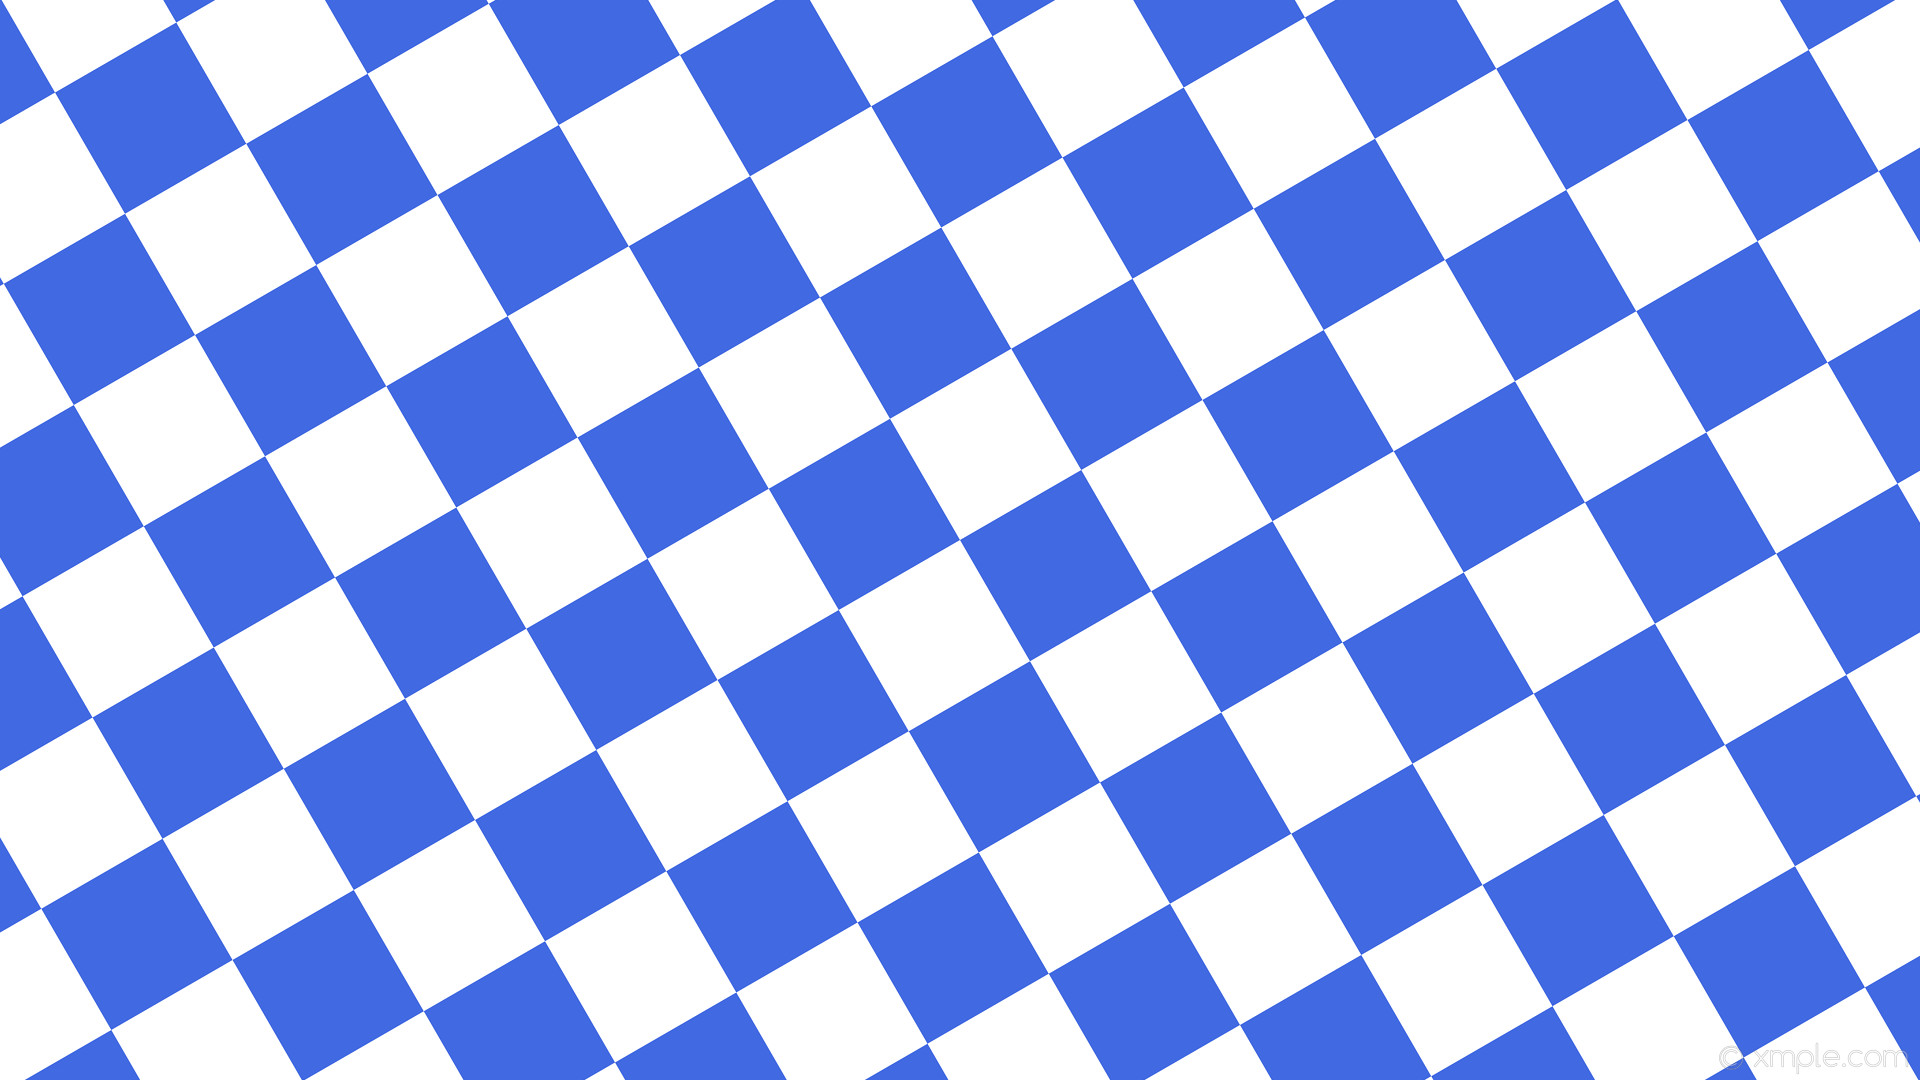 wallpaper squares checkered white blue royal blue #4169e1 #ffffff diagonal  30° 140px